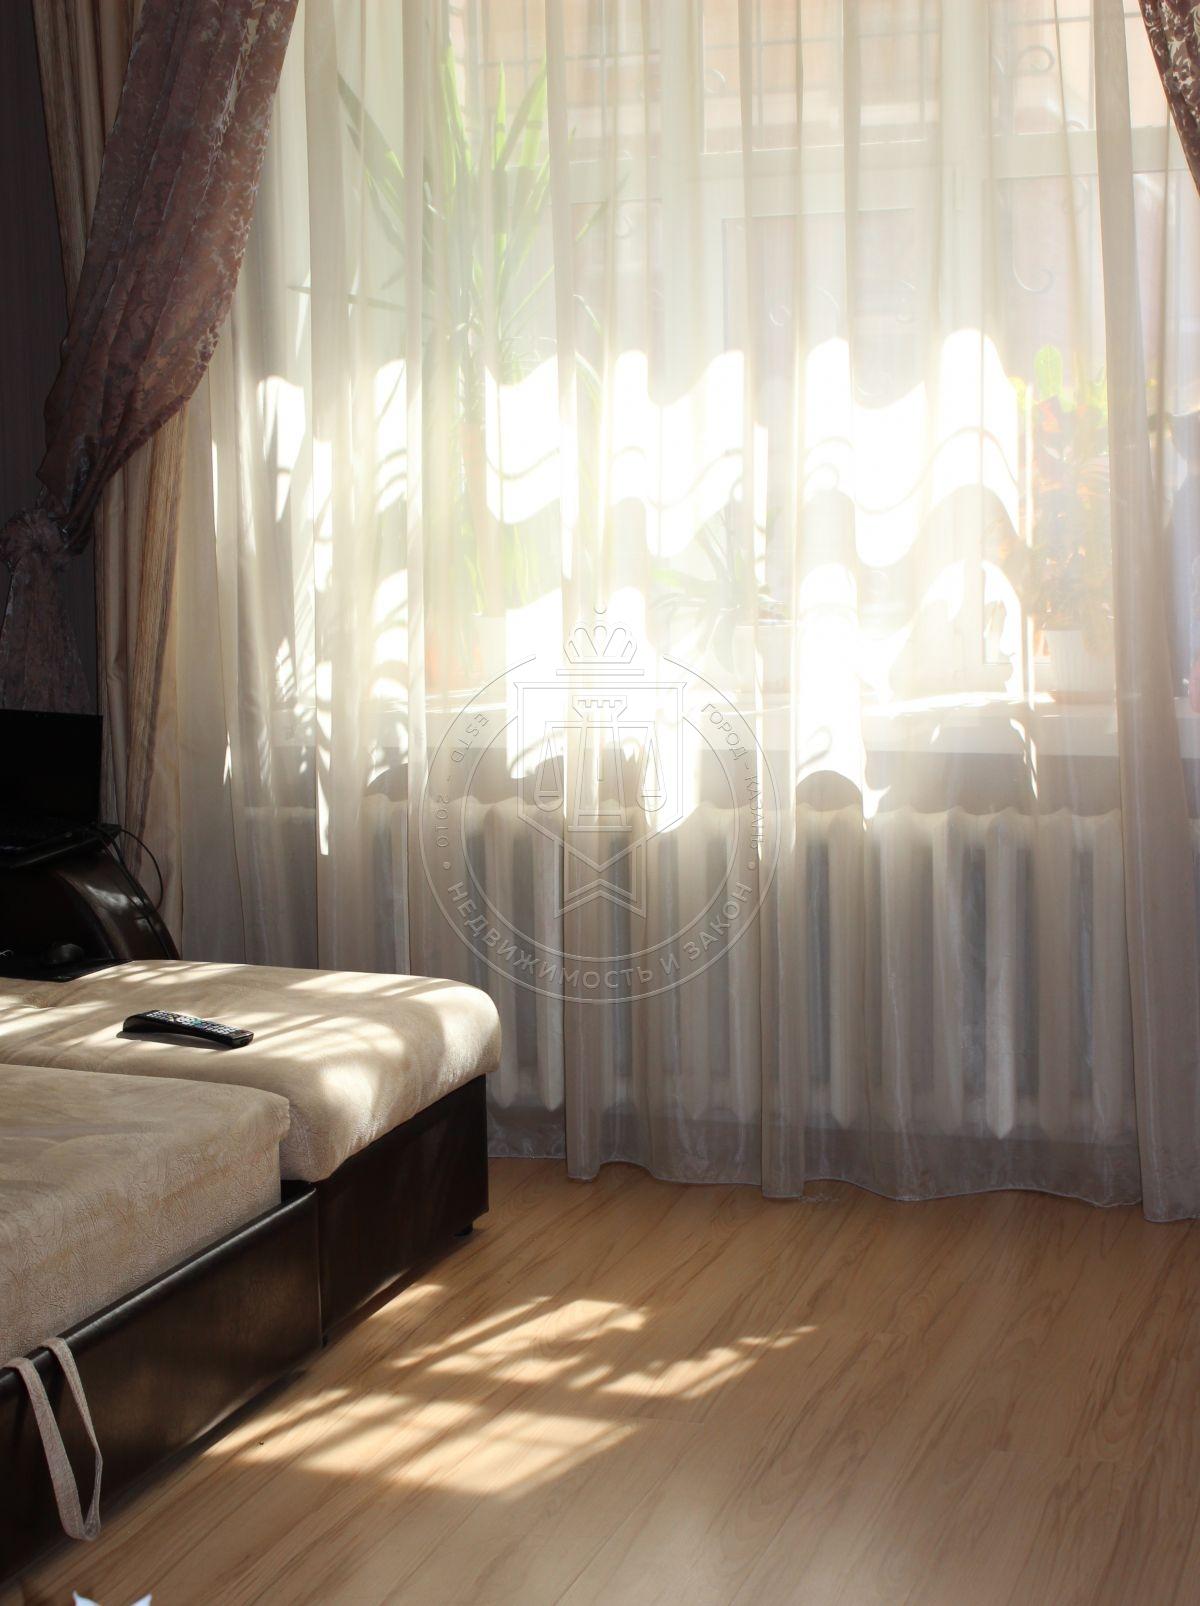 Продажа 2-к квартиры Баки Урманче ул, 6, 70 м2  (миниатюра №1)